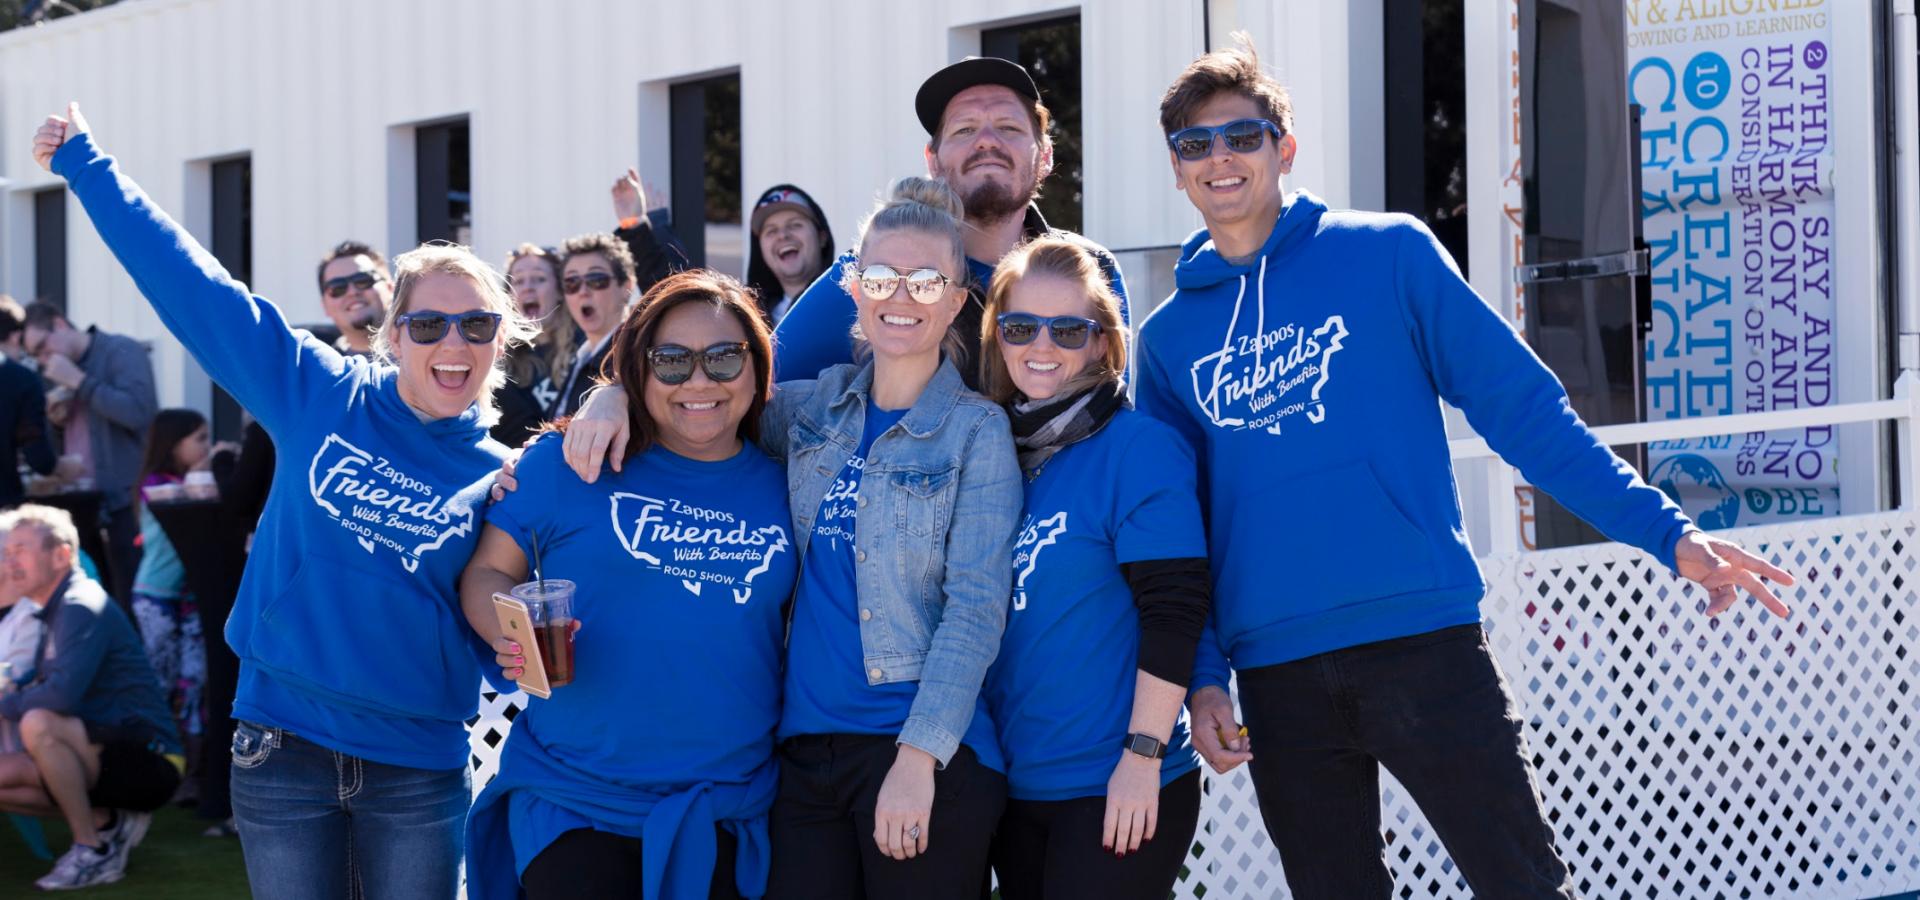 Zappos - Tour Friends